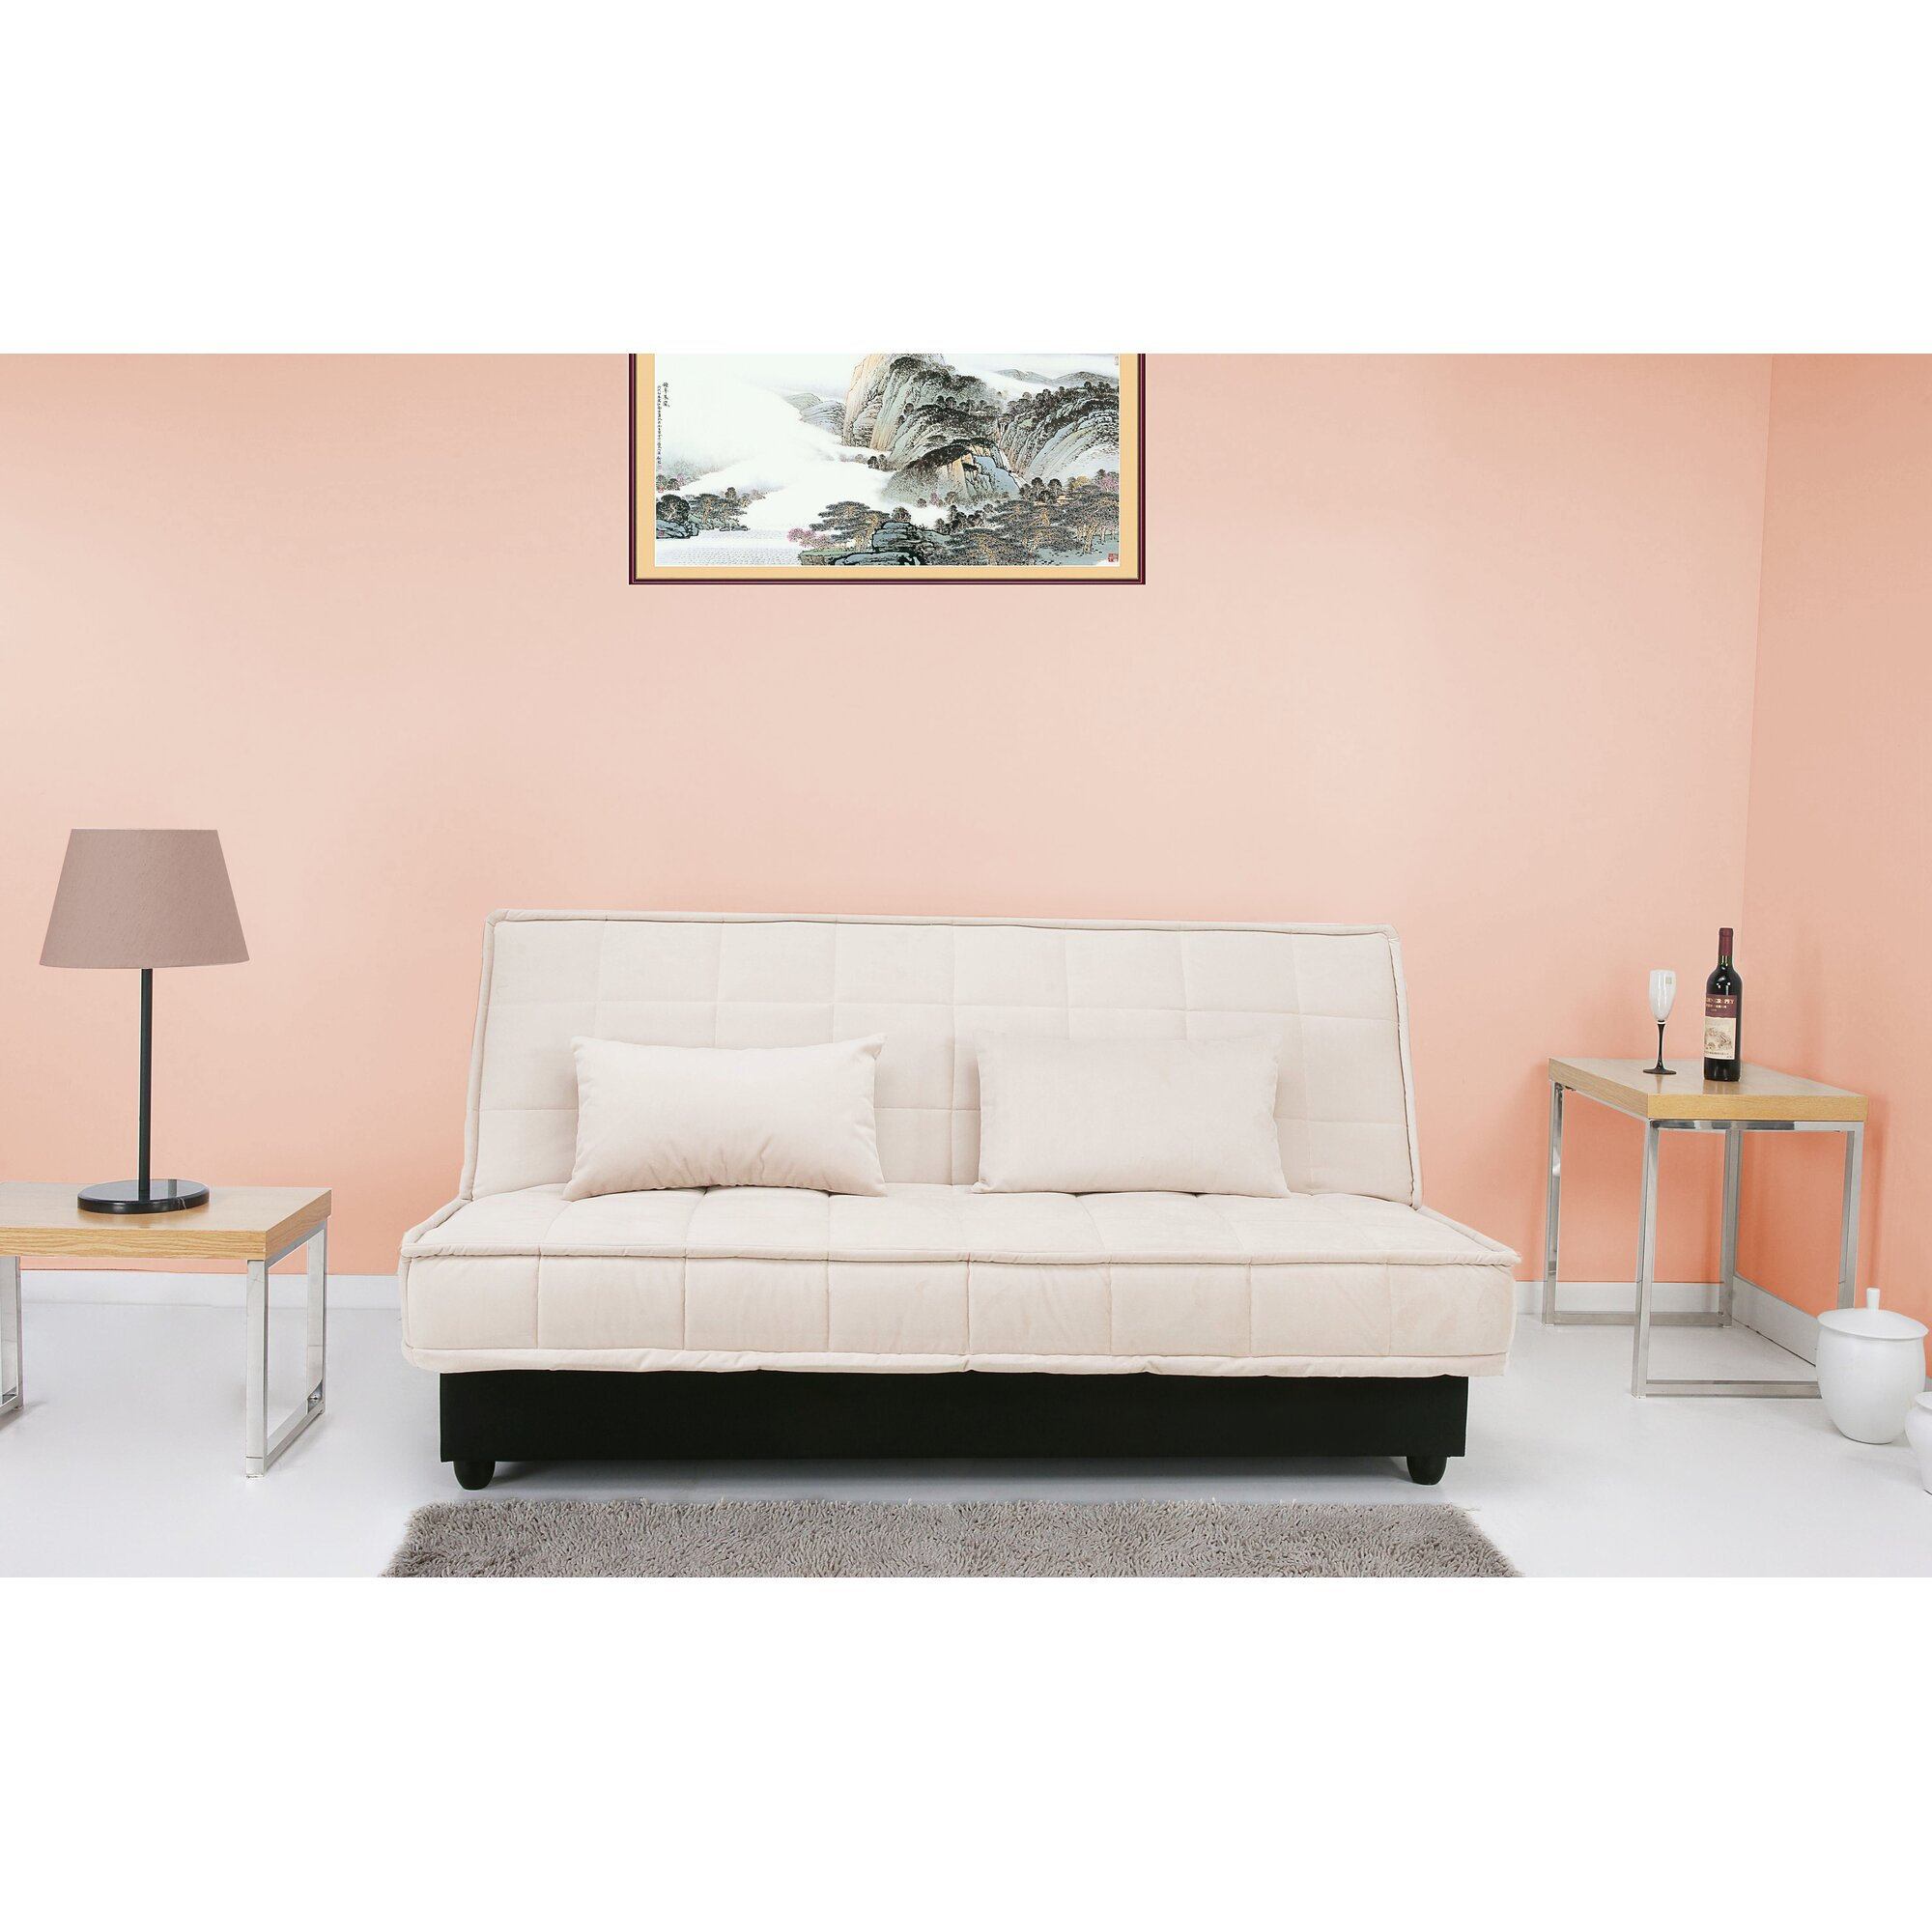 leader lifestyle yoko 3 seater clic clac sofa bed. Black Bedroom Furniture Sets. Home Design Ideas